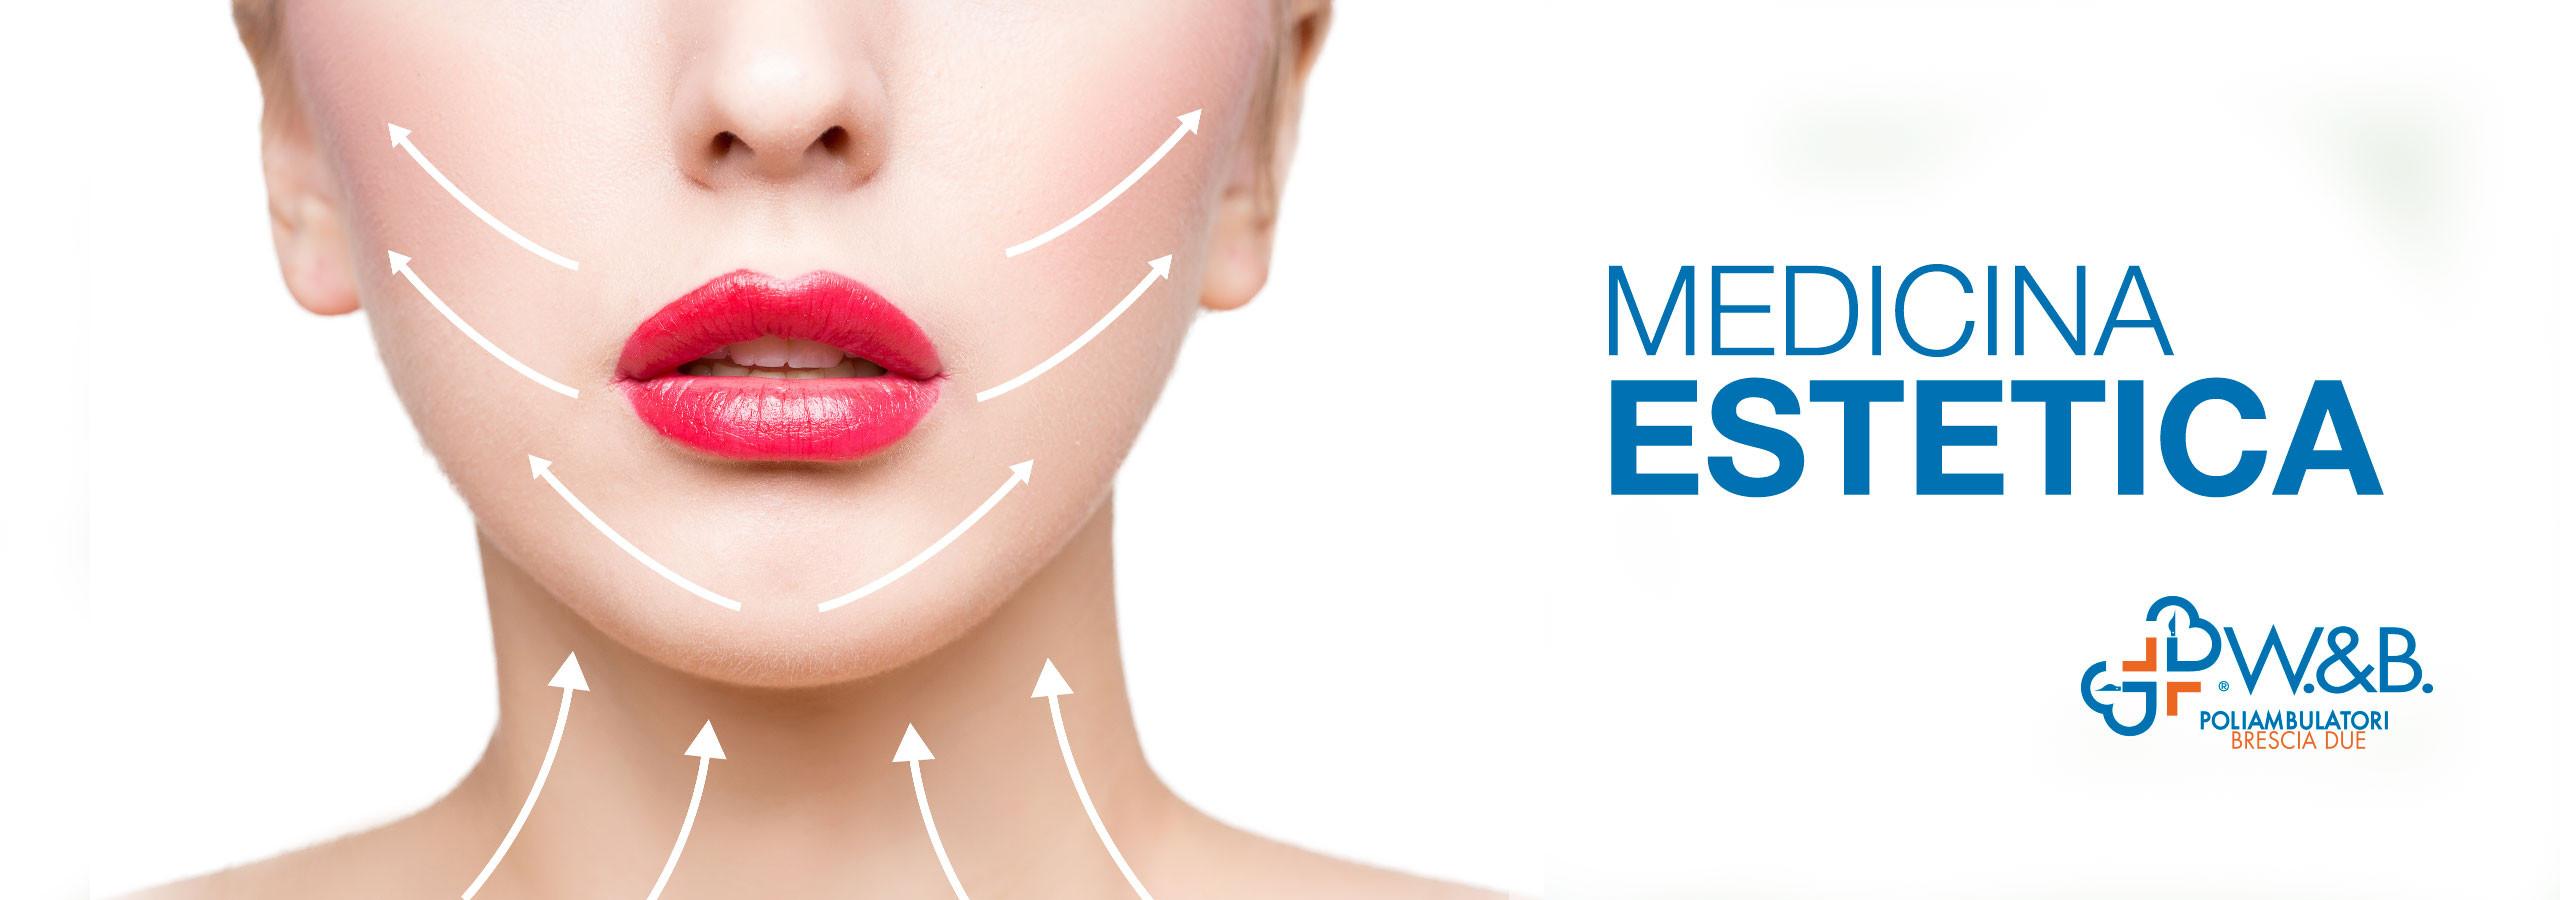 slide_medicina-estetica